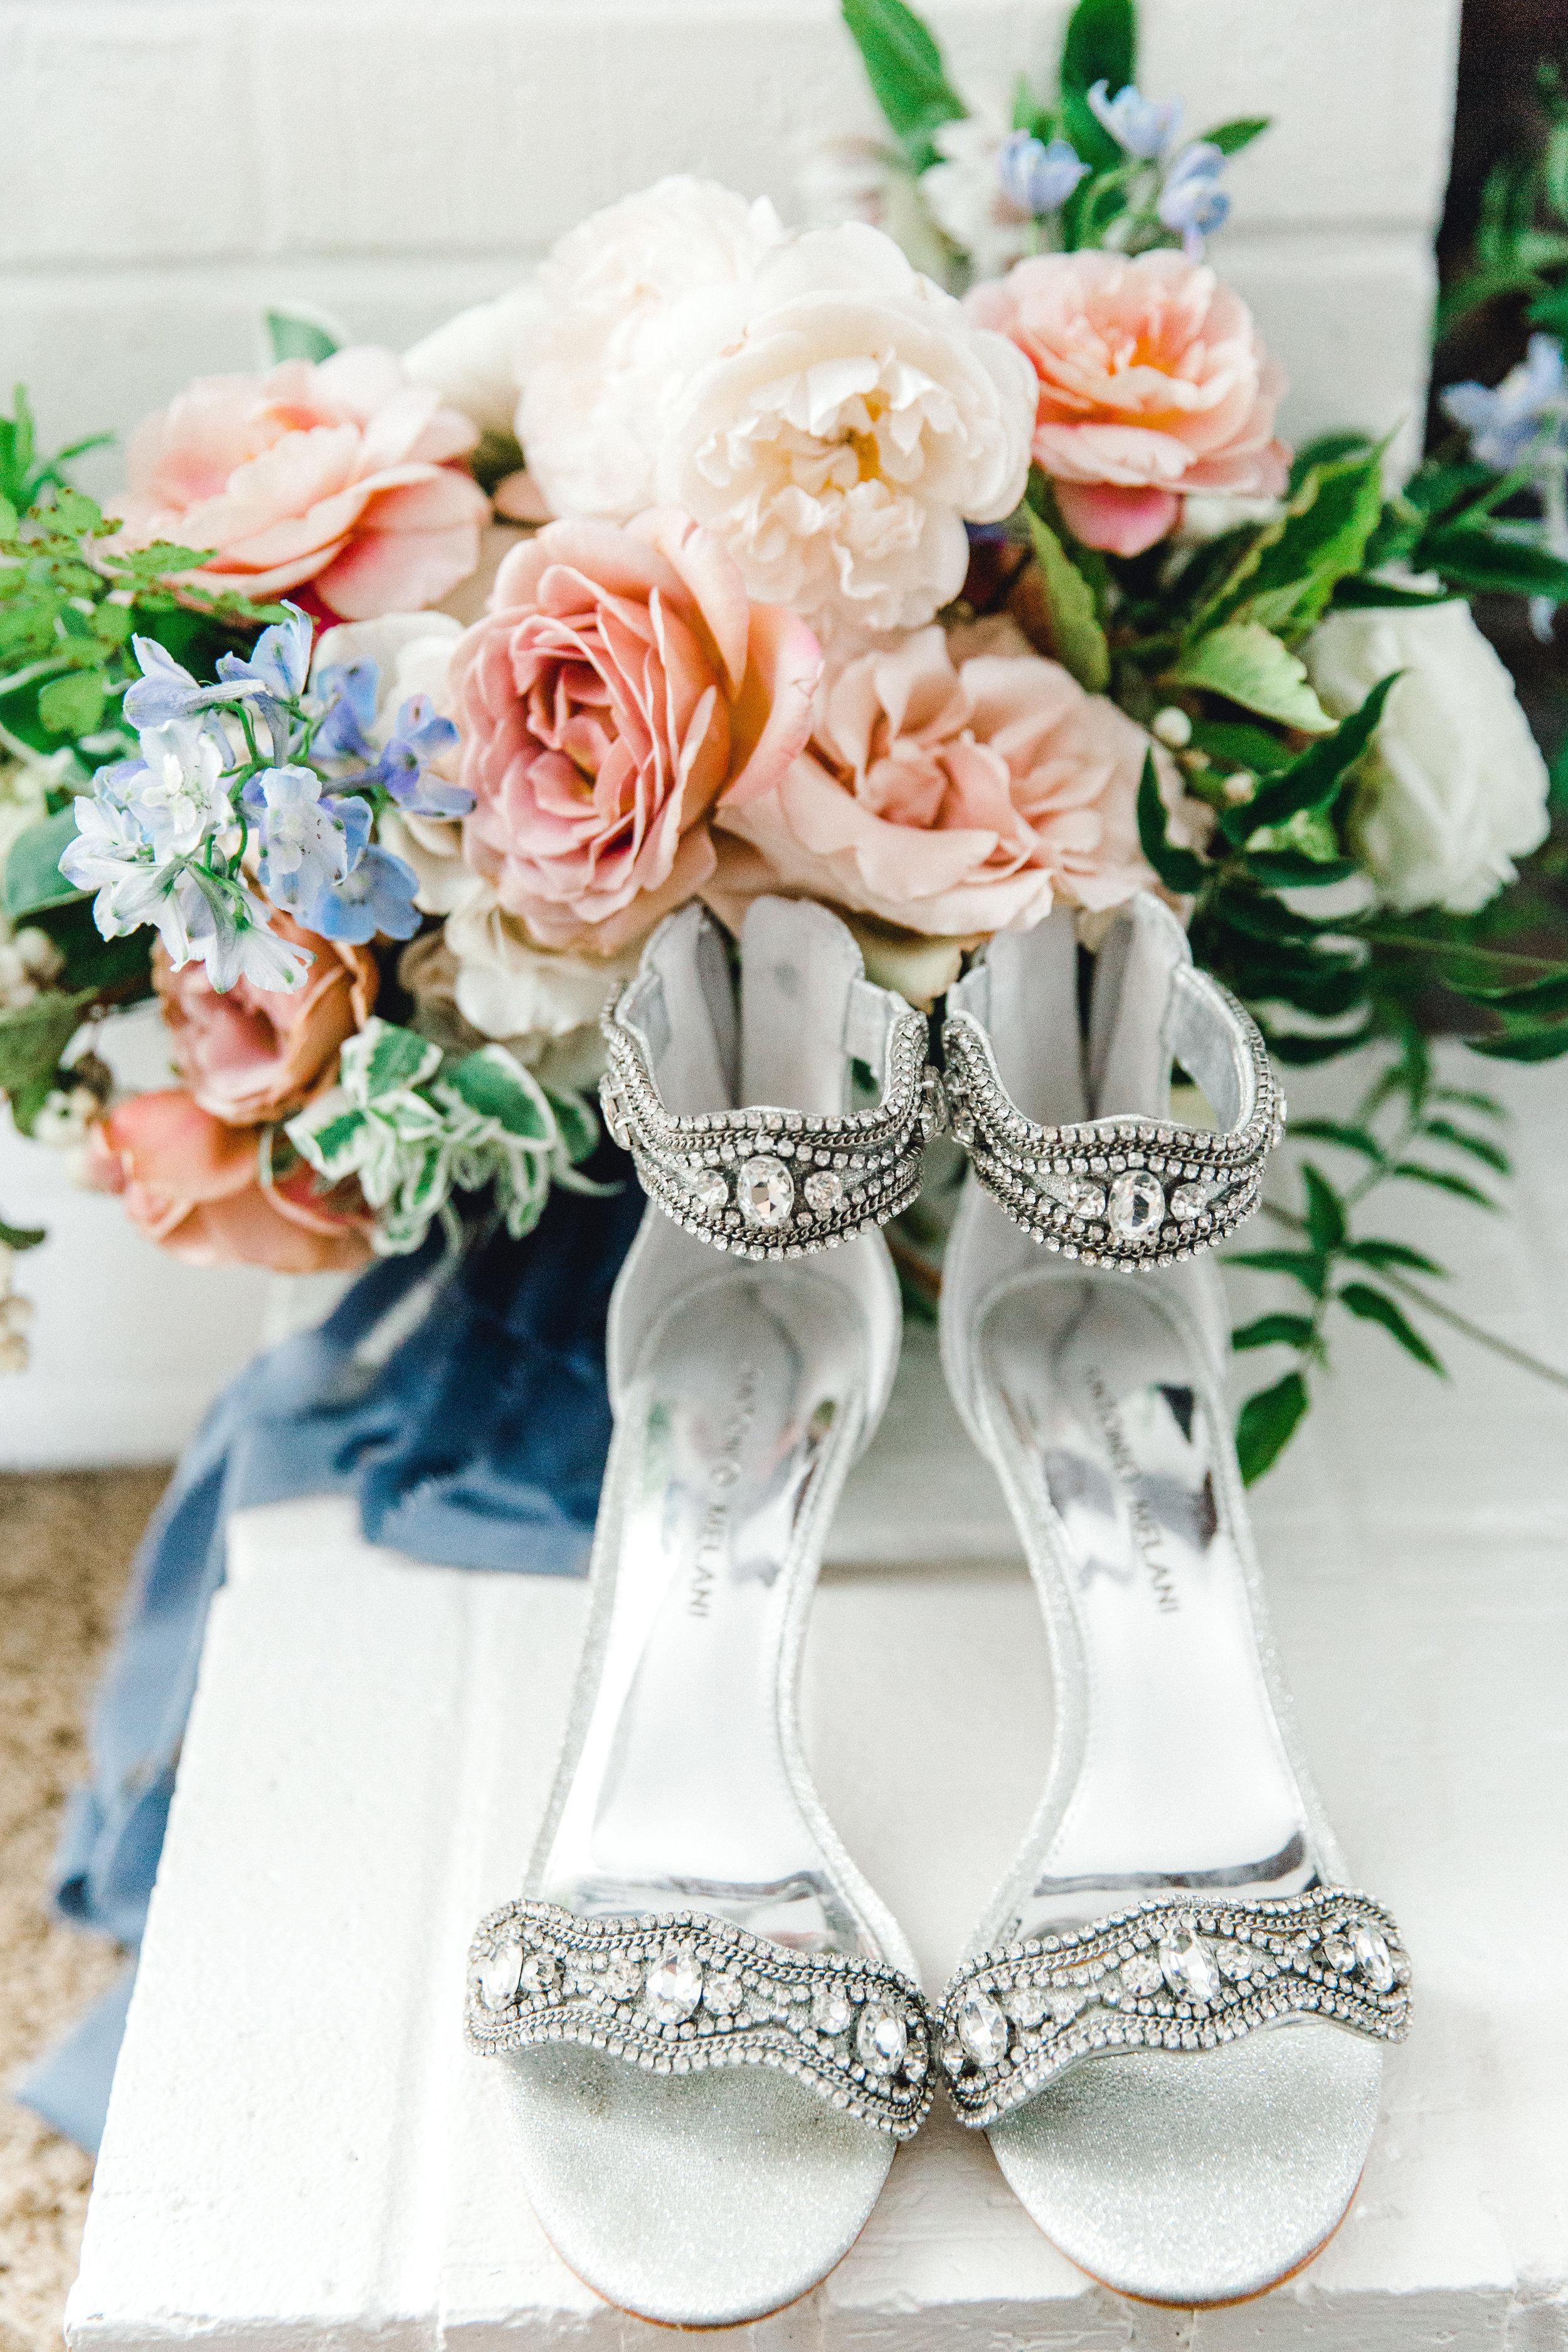 Paige-Mercer-Photography-Florida-Wedding-Photographer-Alyssa&Drew-3.jpg